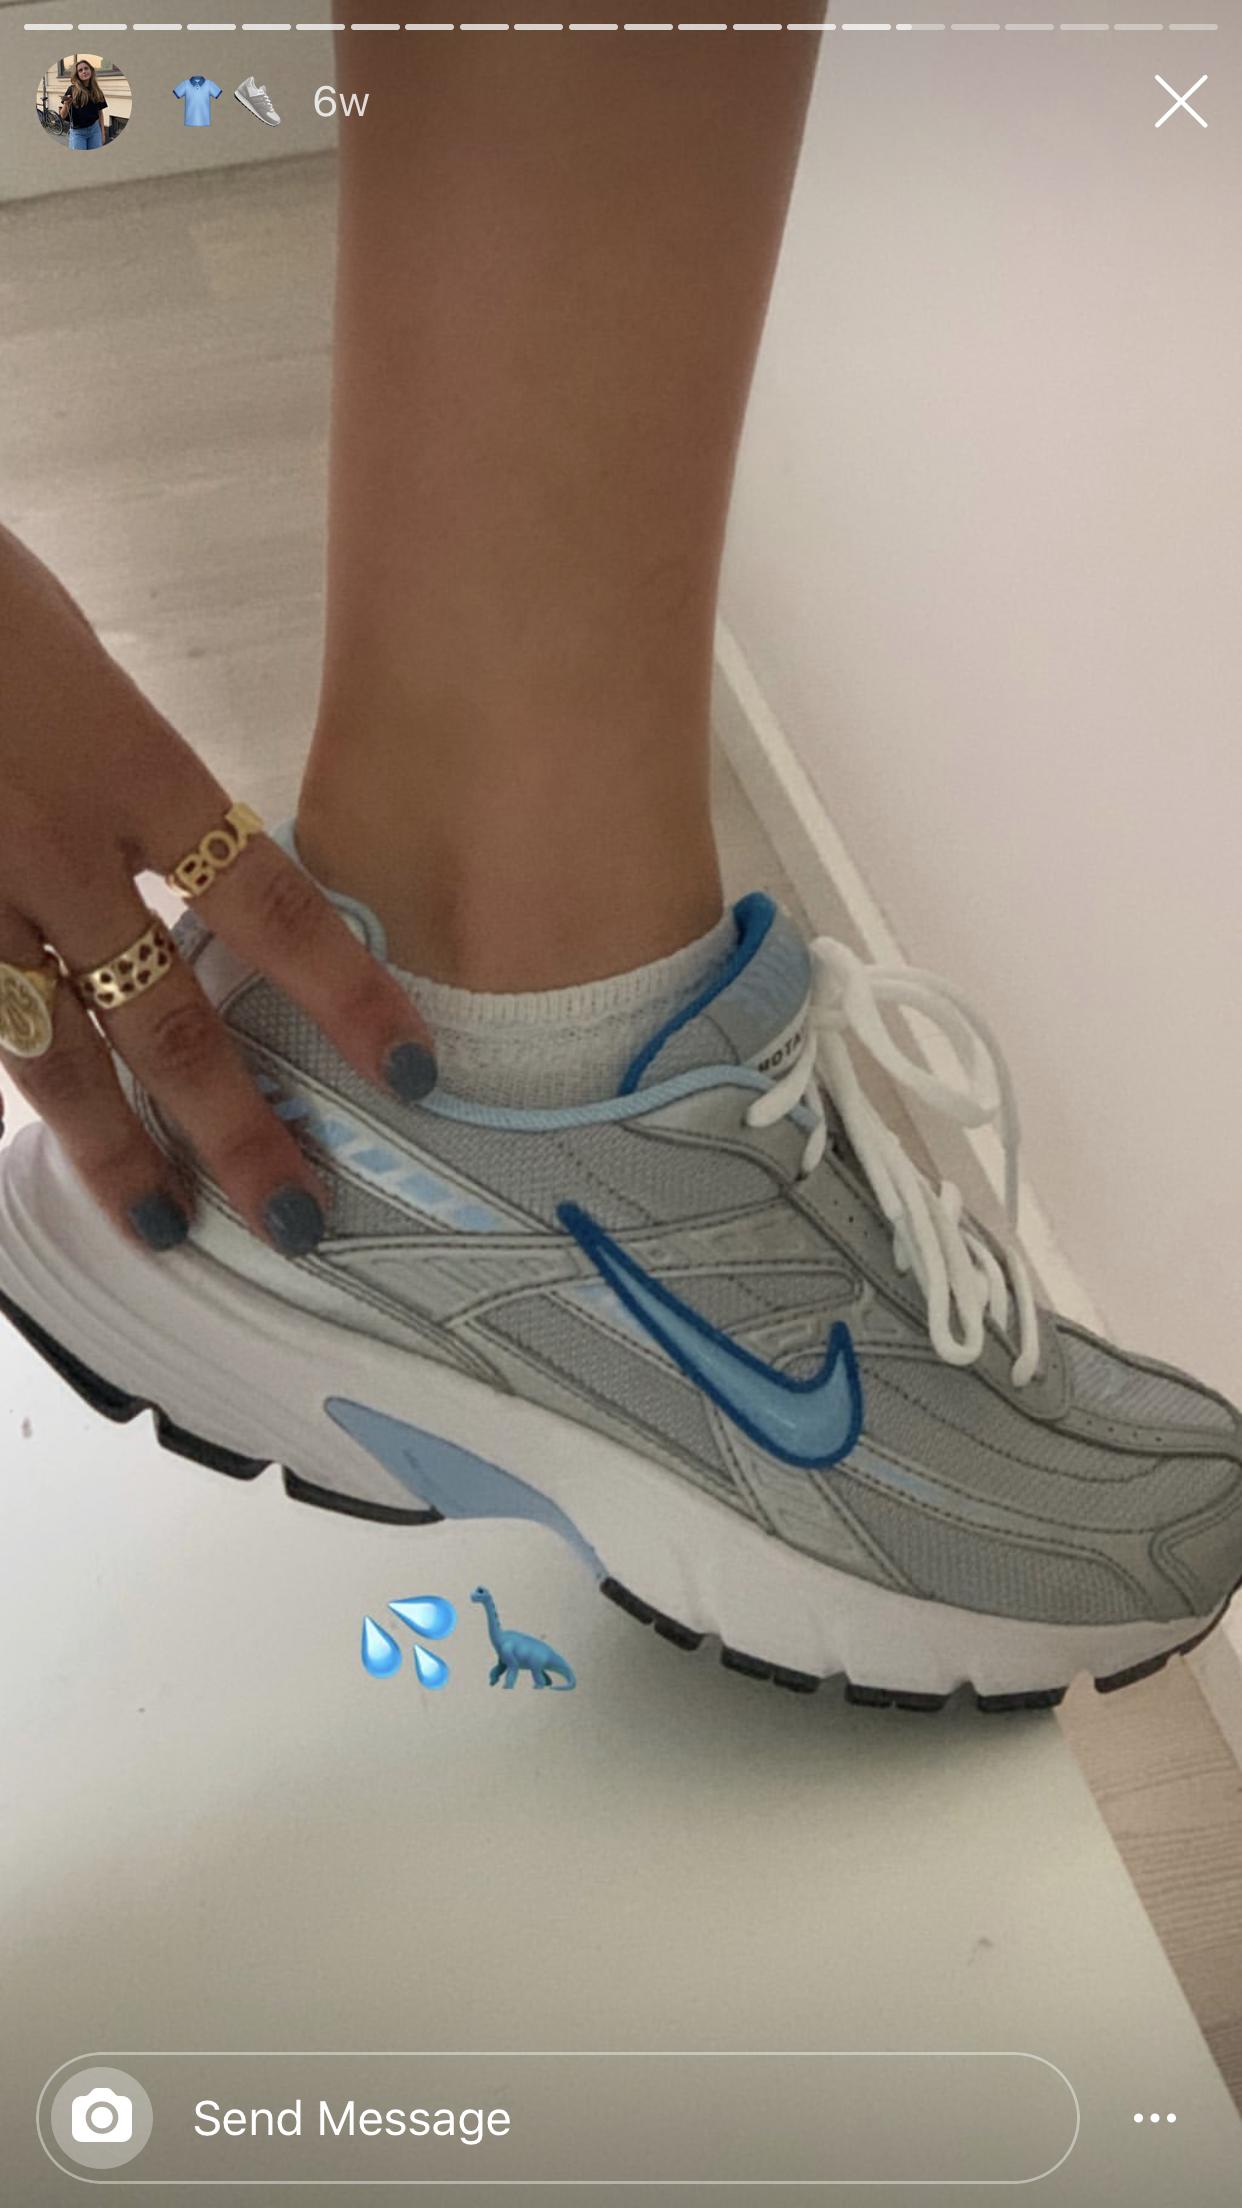 Pin af Monika Penkert på shoes Fodtøj, Sko sneakers